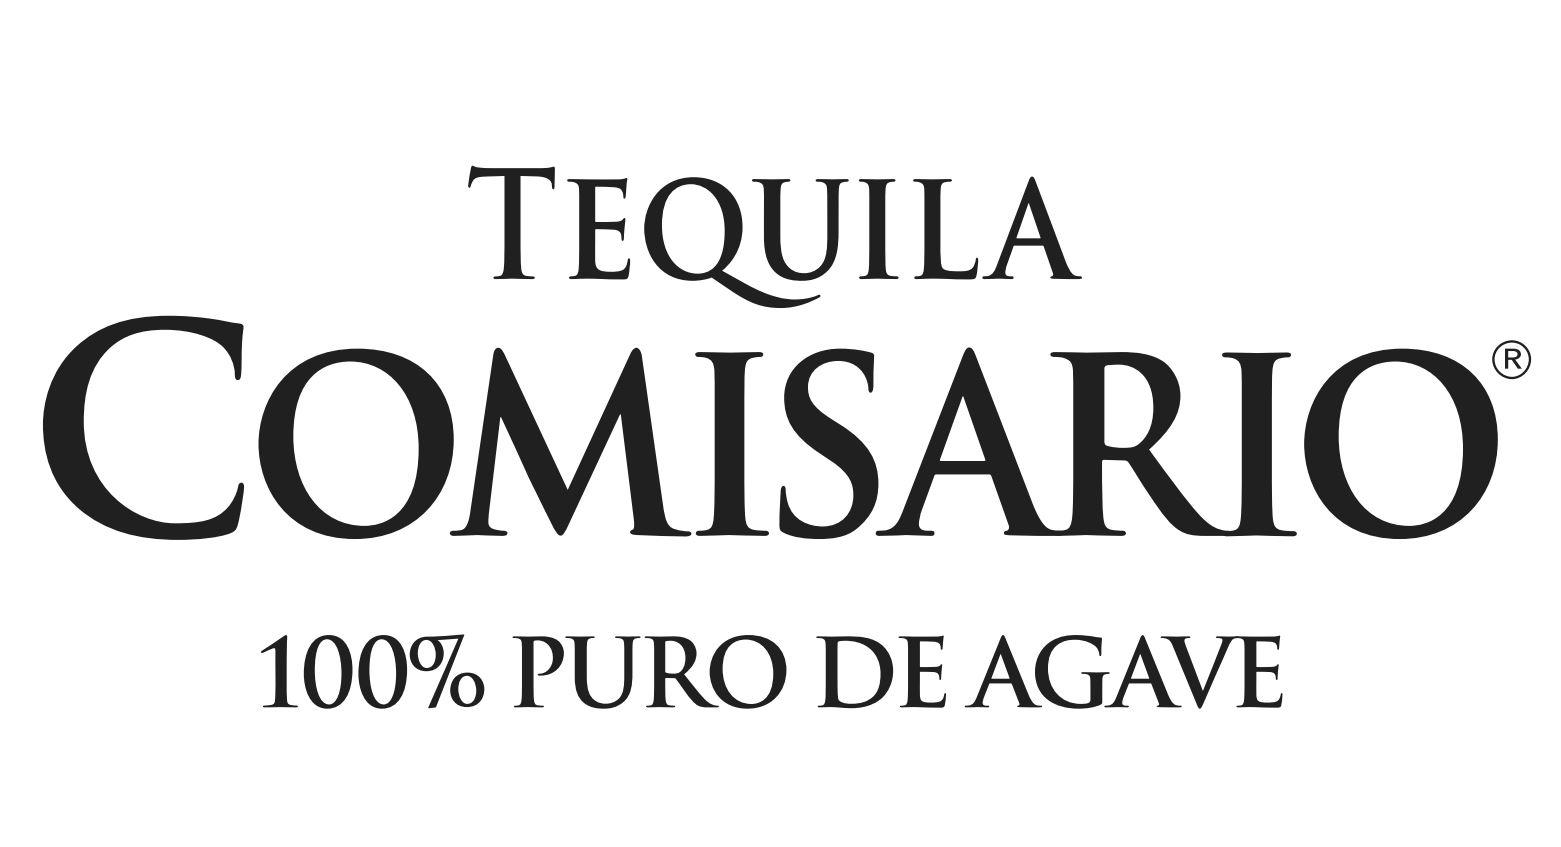 tequila comisario.JPG